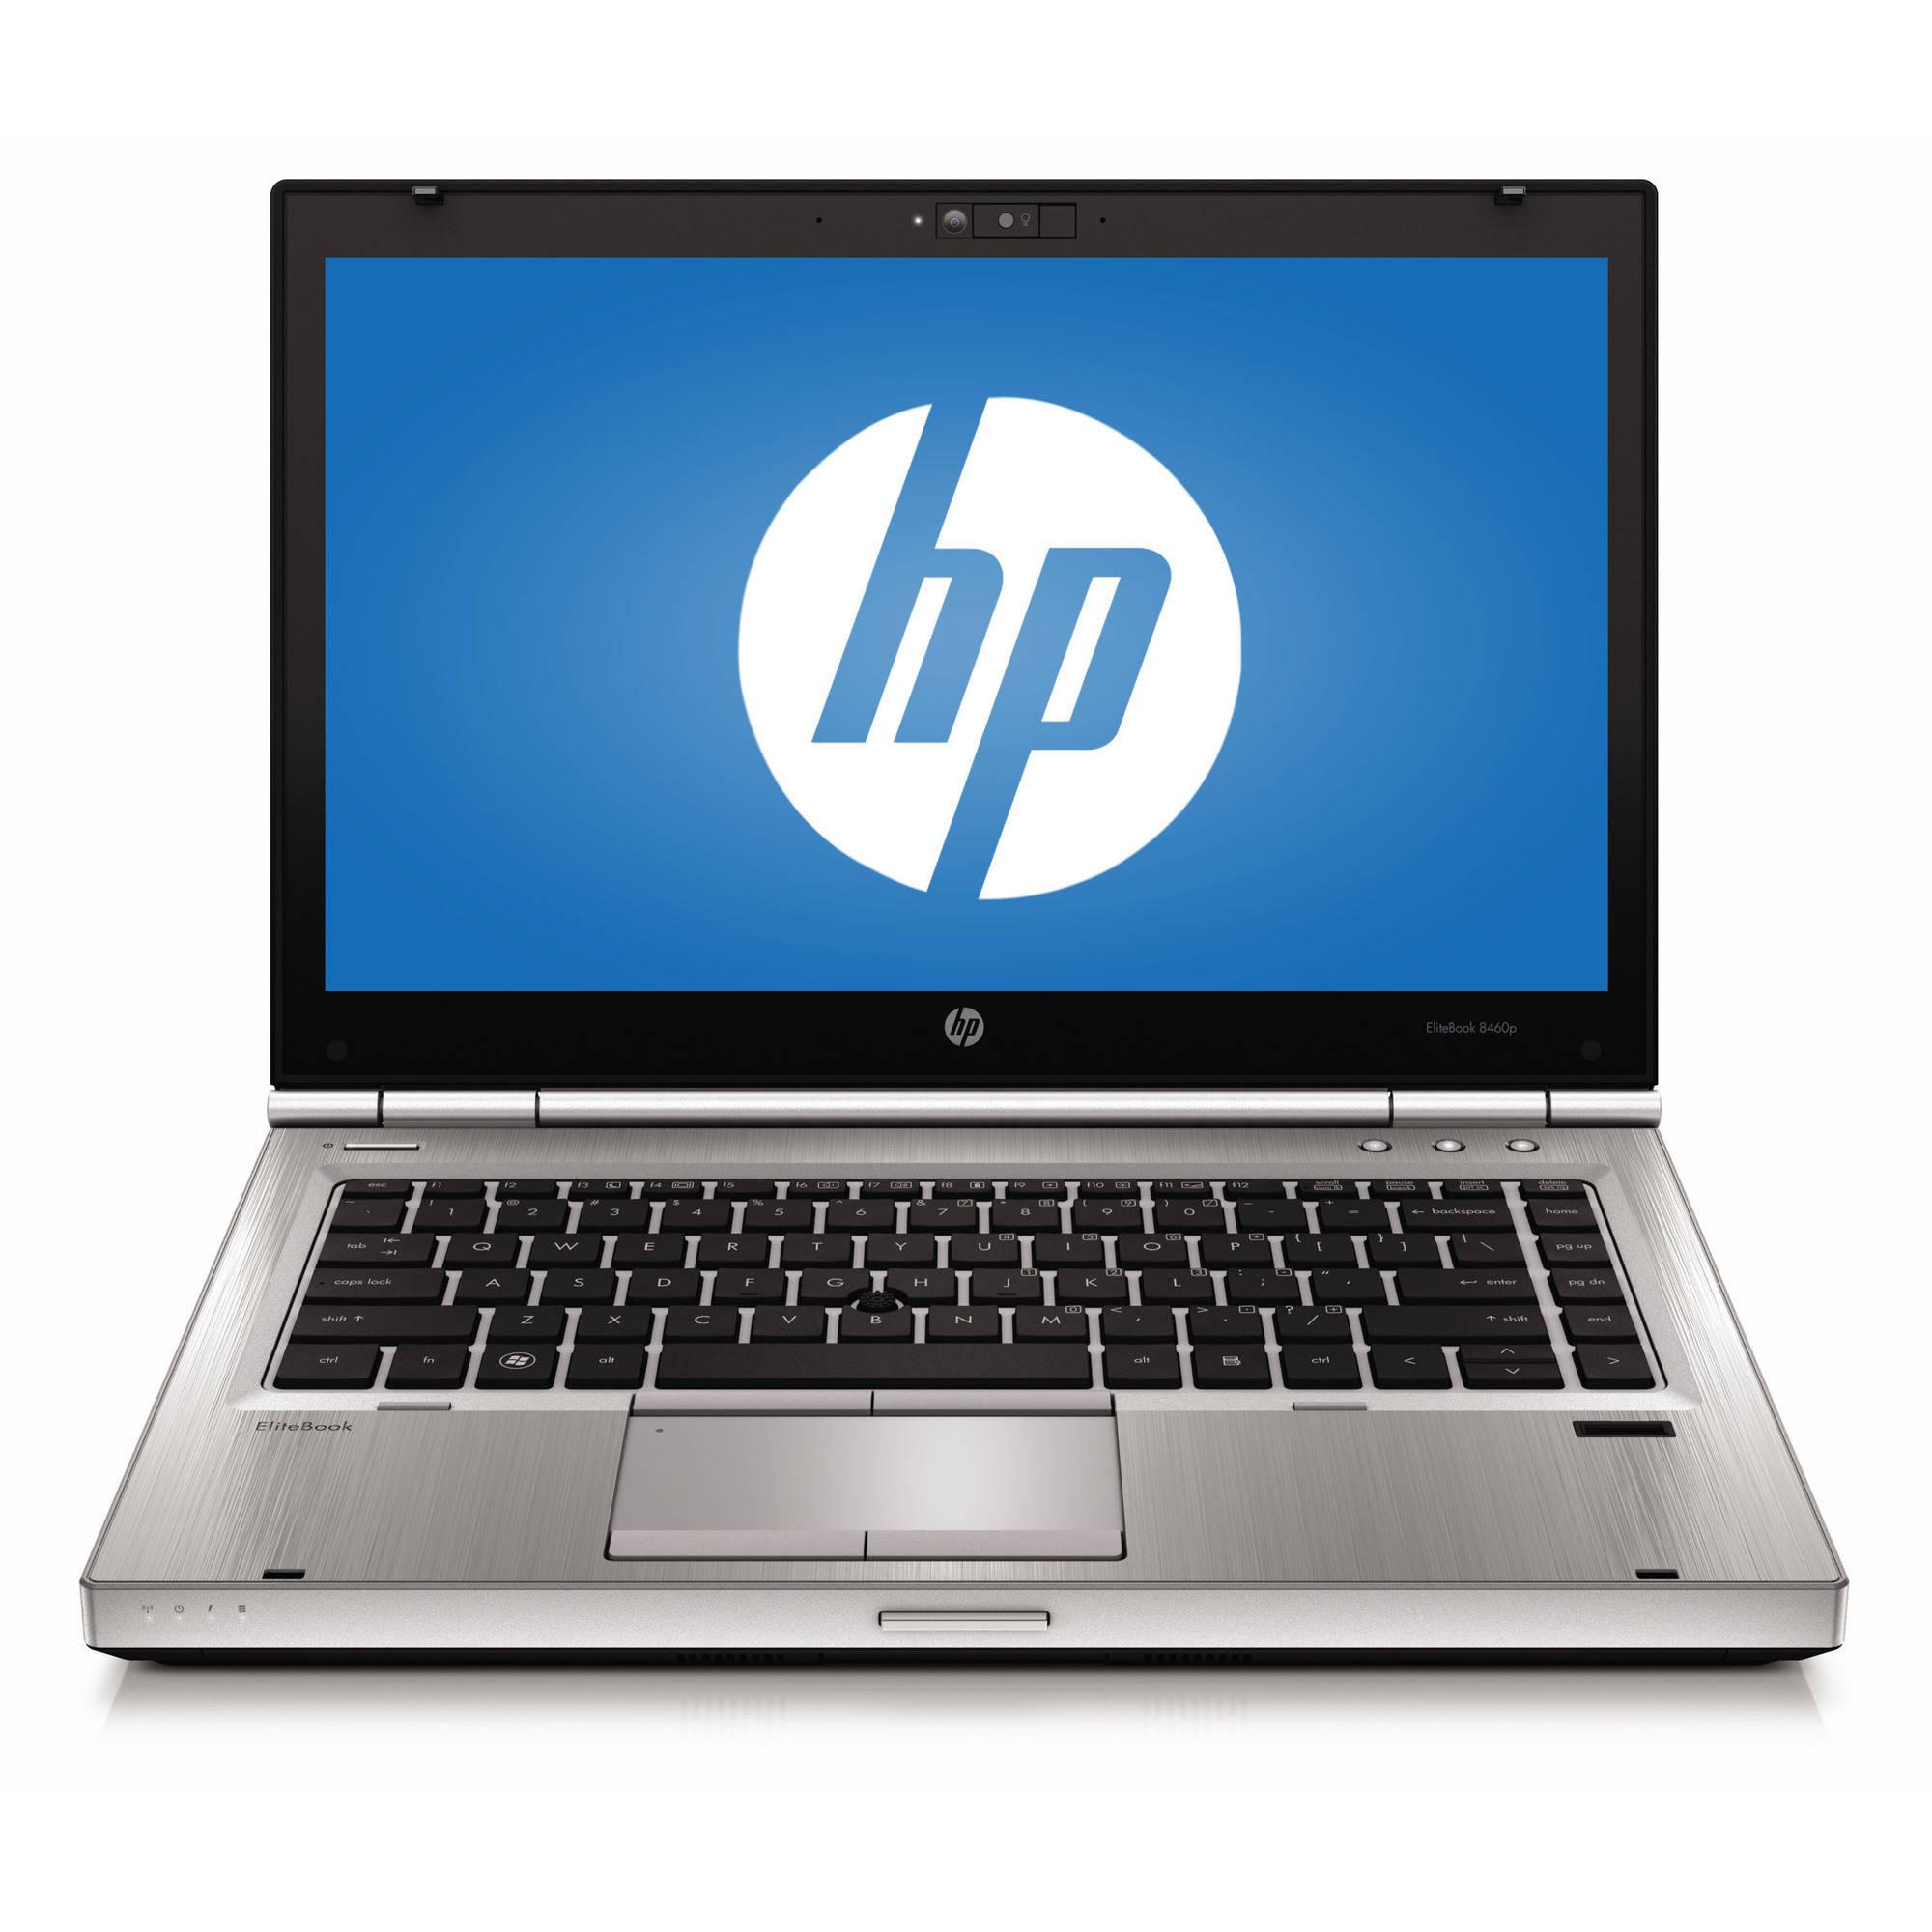 HP LJ540UT EliteBook 8460p - Core i5 2450M / 2.5 GHz - Wi...